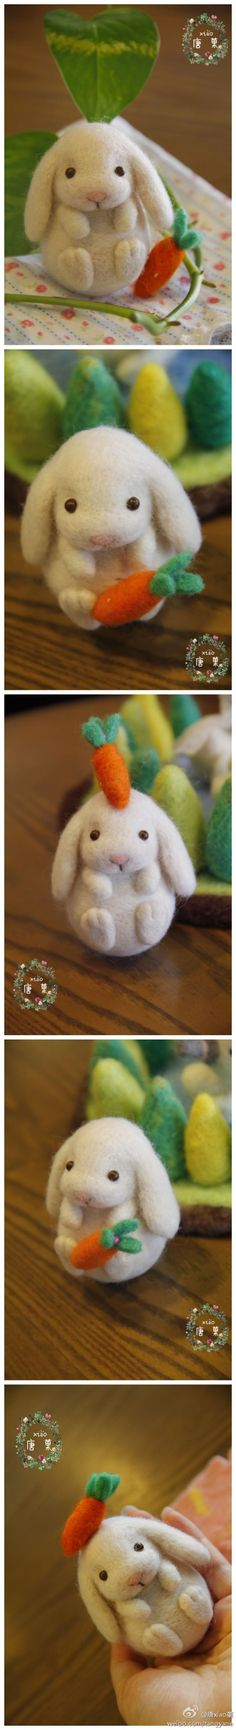 Wool Felt Bunny                                                                                                                                                                                 More